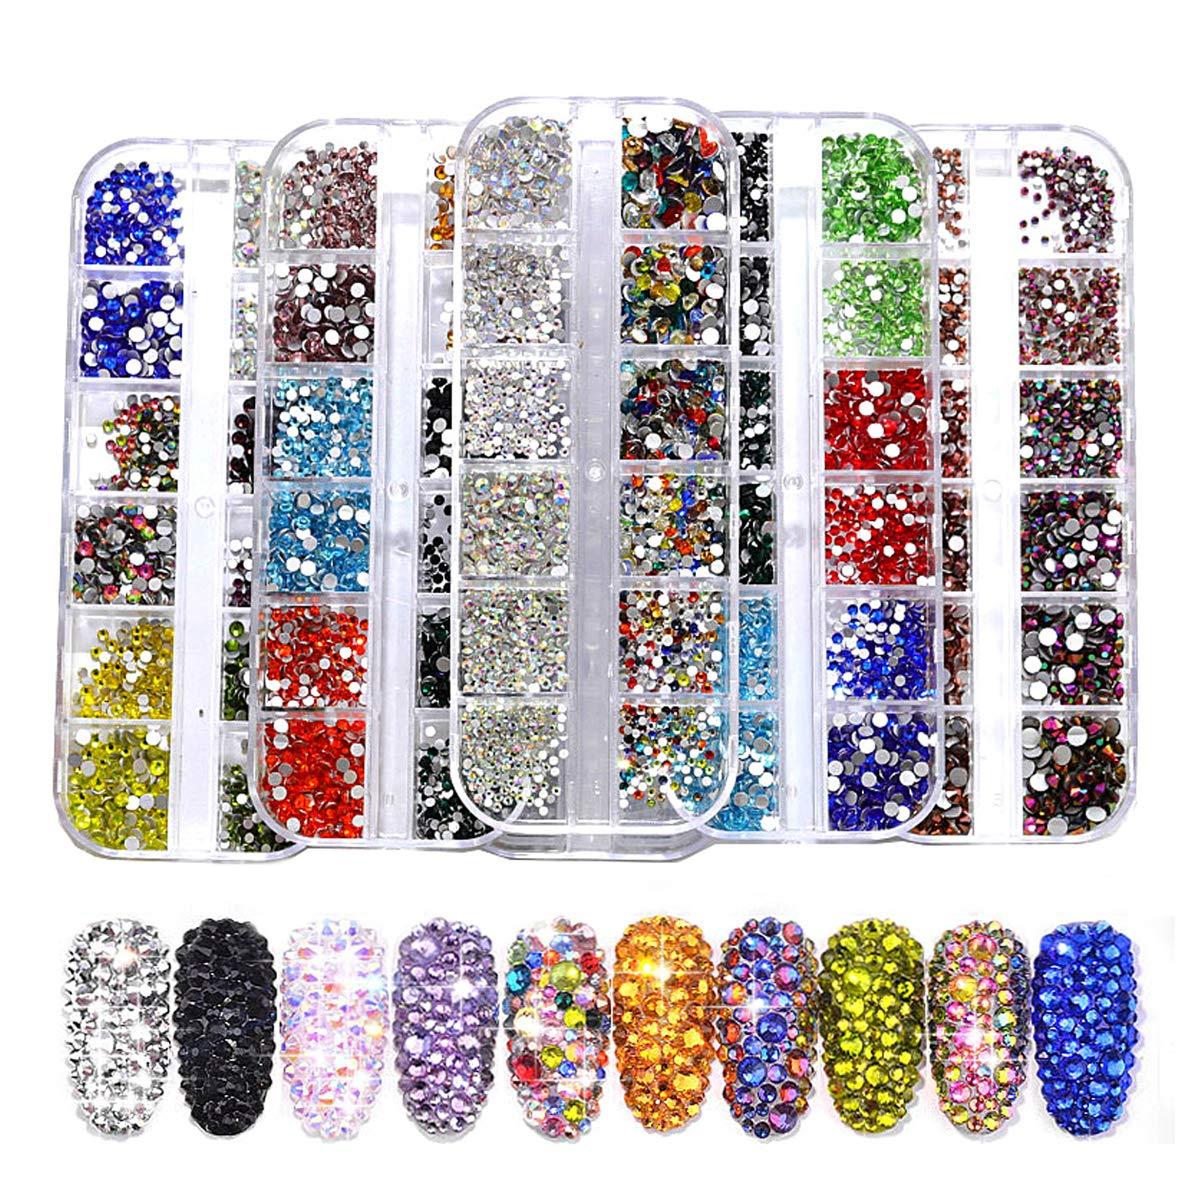 BLINGINBOX Nail Art Rhinestones 3300pcs Multi-size Glass 2 Boxes Mixed Colors Flatback Crystal Strass Charm Gems Manicure Nail Art Decorations(Set 6)